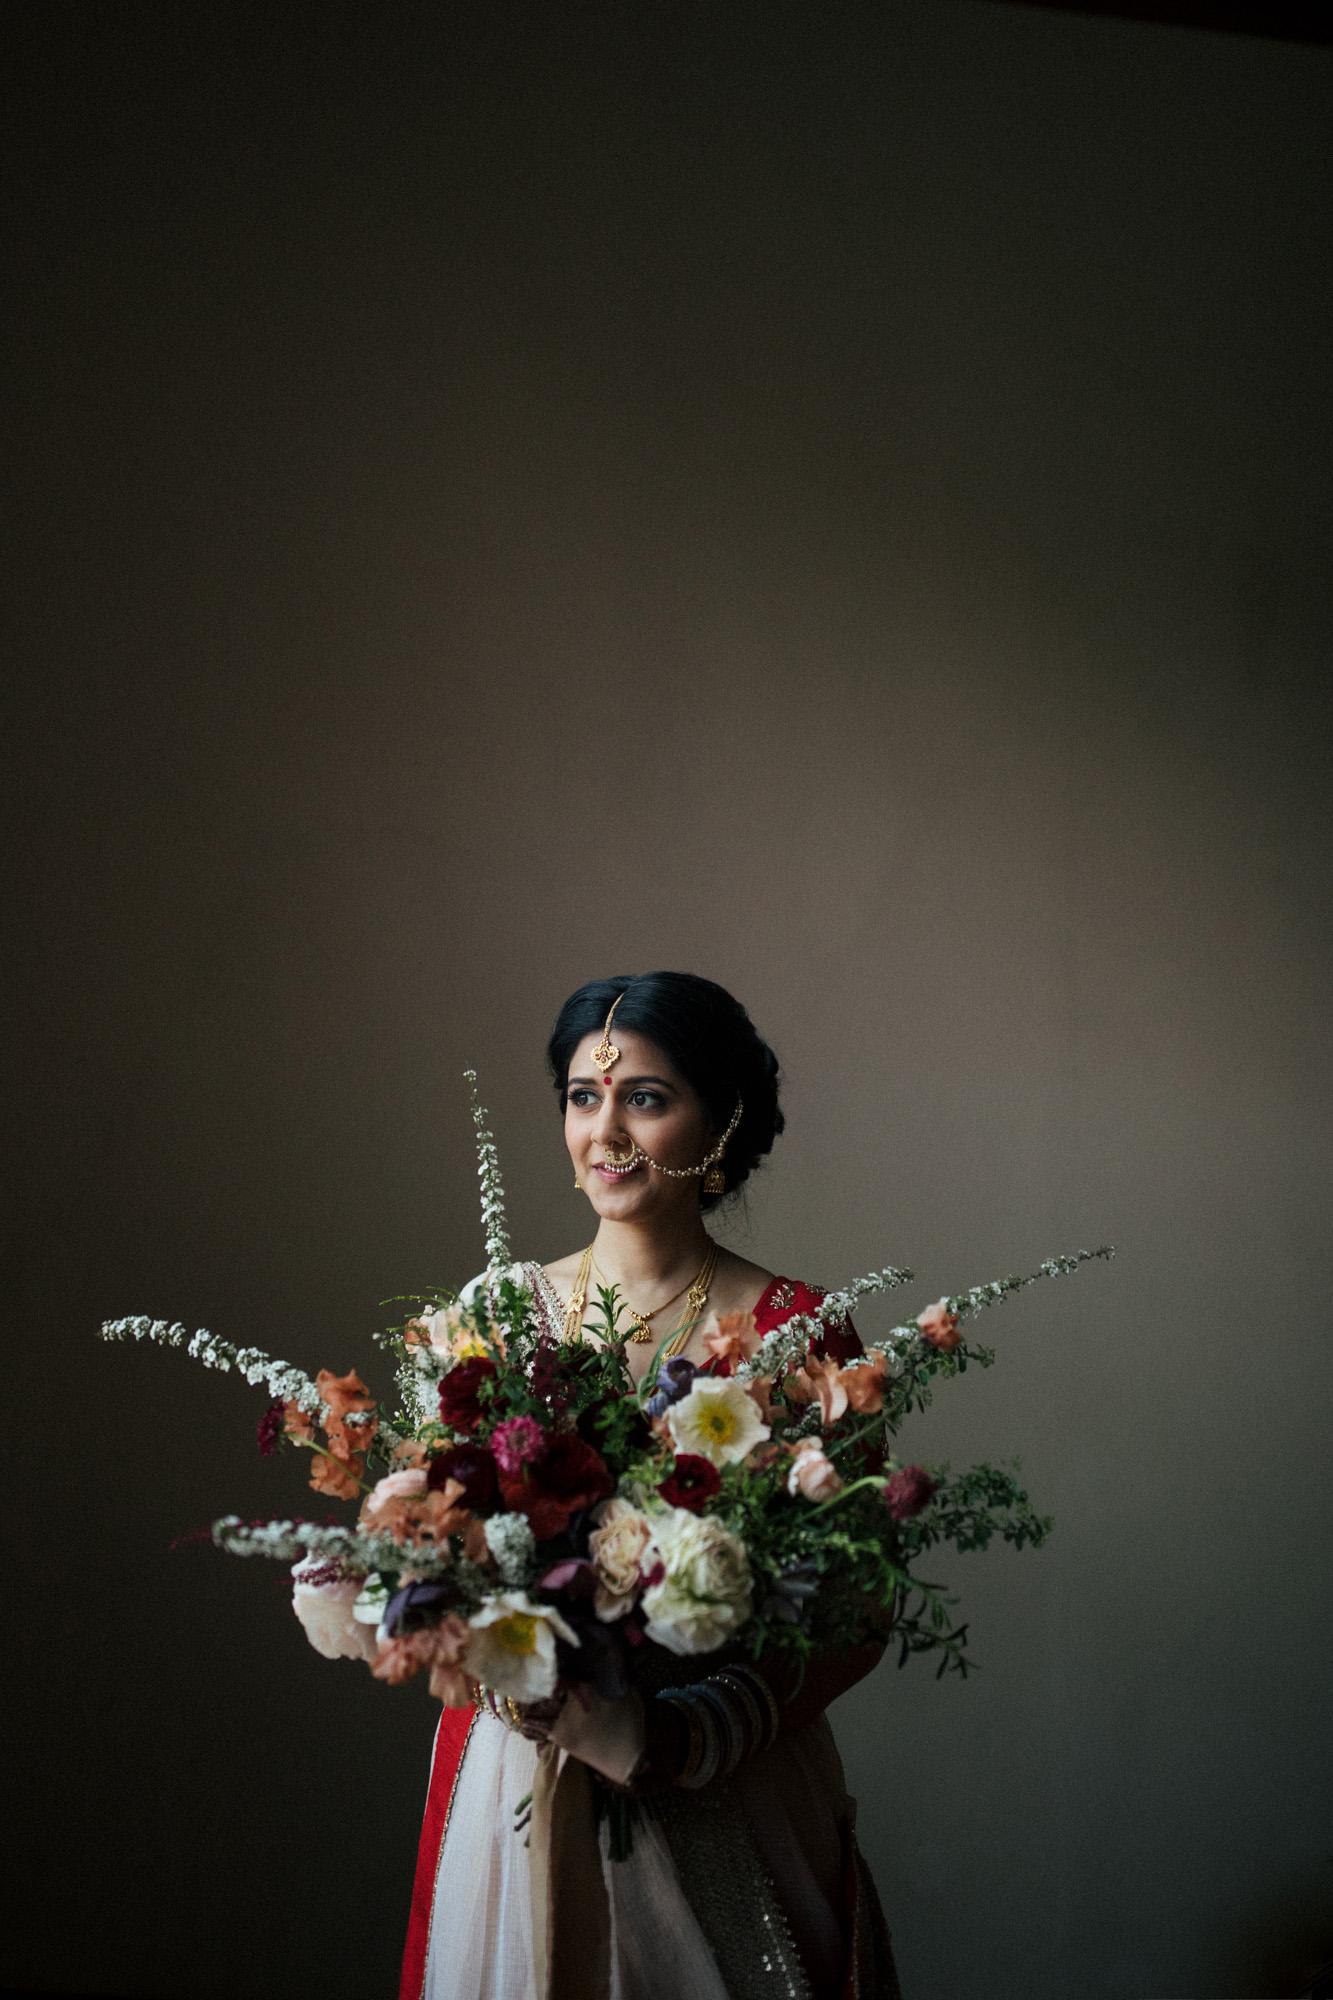 anu_maneesh_alec_vanderboom_Indian_wedding_photography-0054.jpg